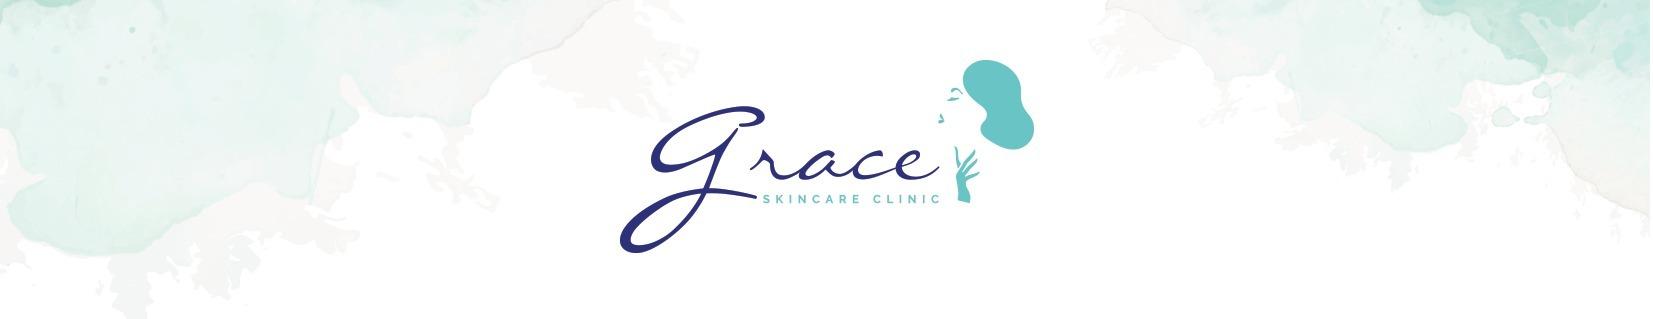 Grace Skincare Clinic (@graceskincareclinic) Cover Image